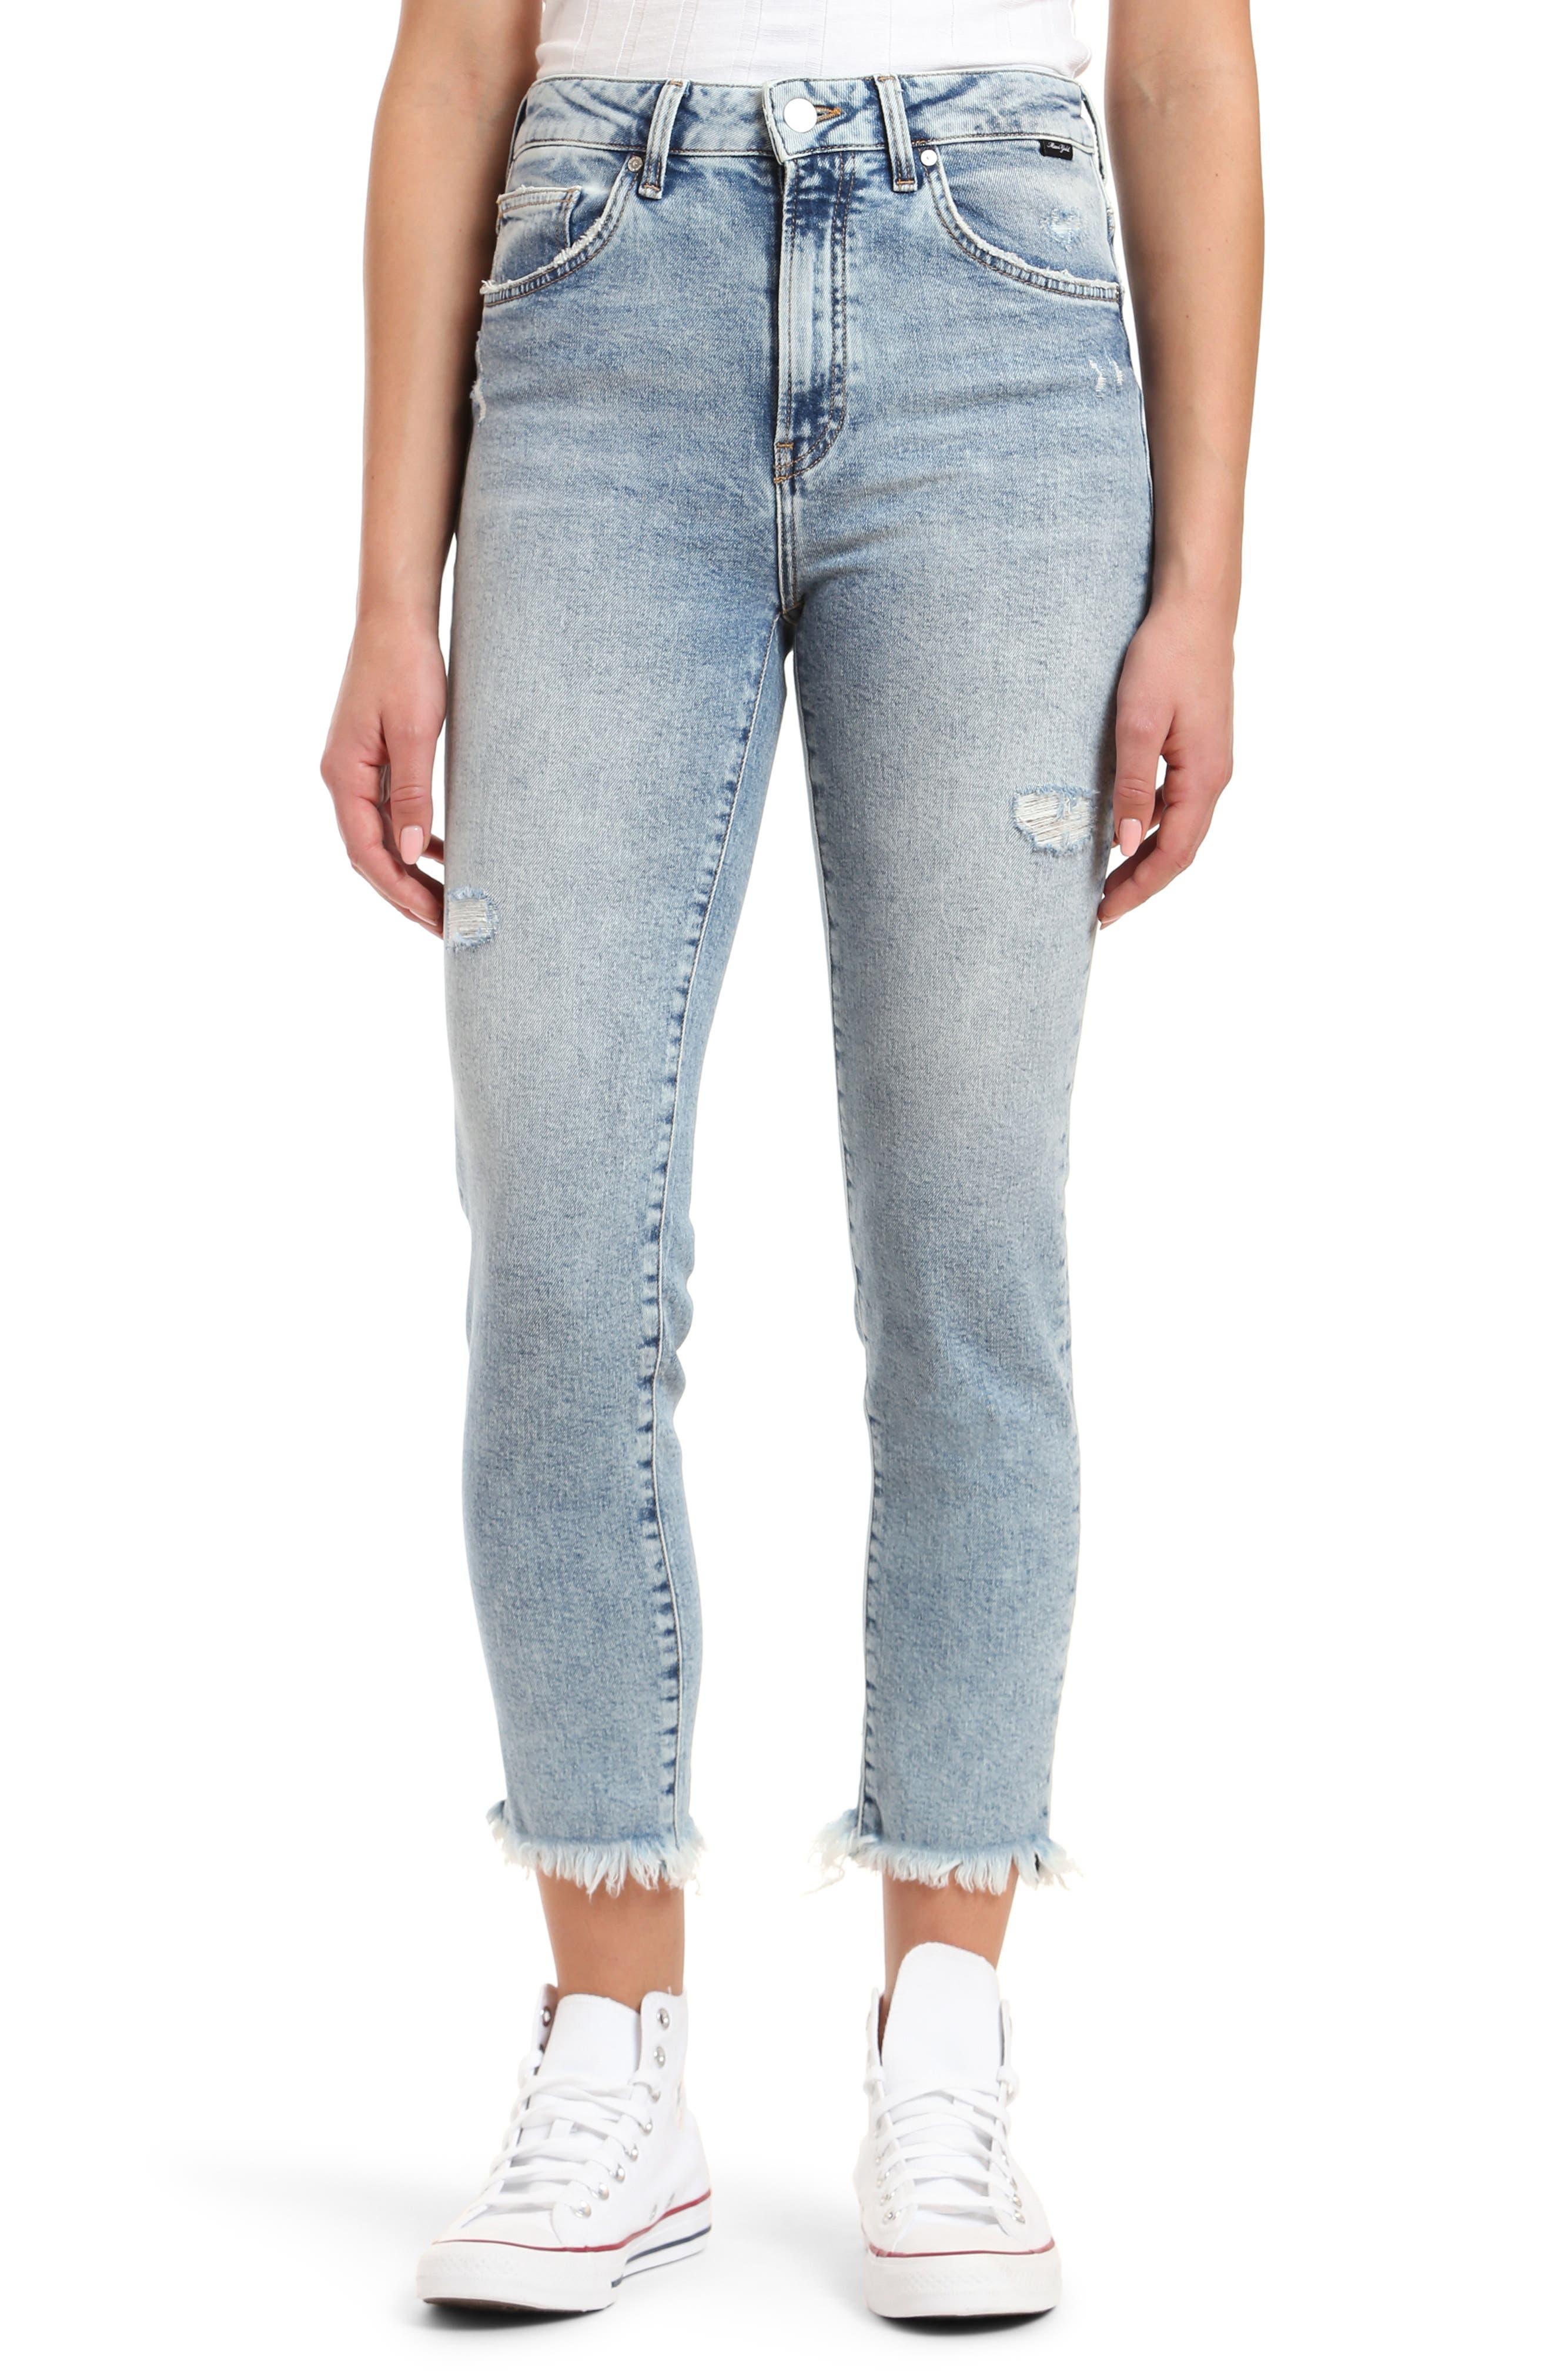 Star High Waist Distressed Fray Hem Straight Leg Jeans